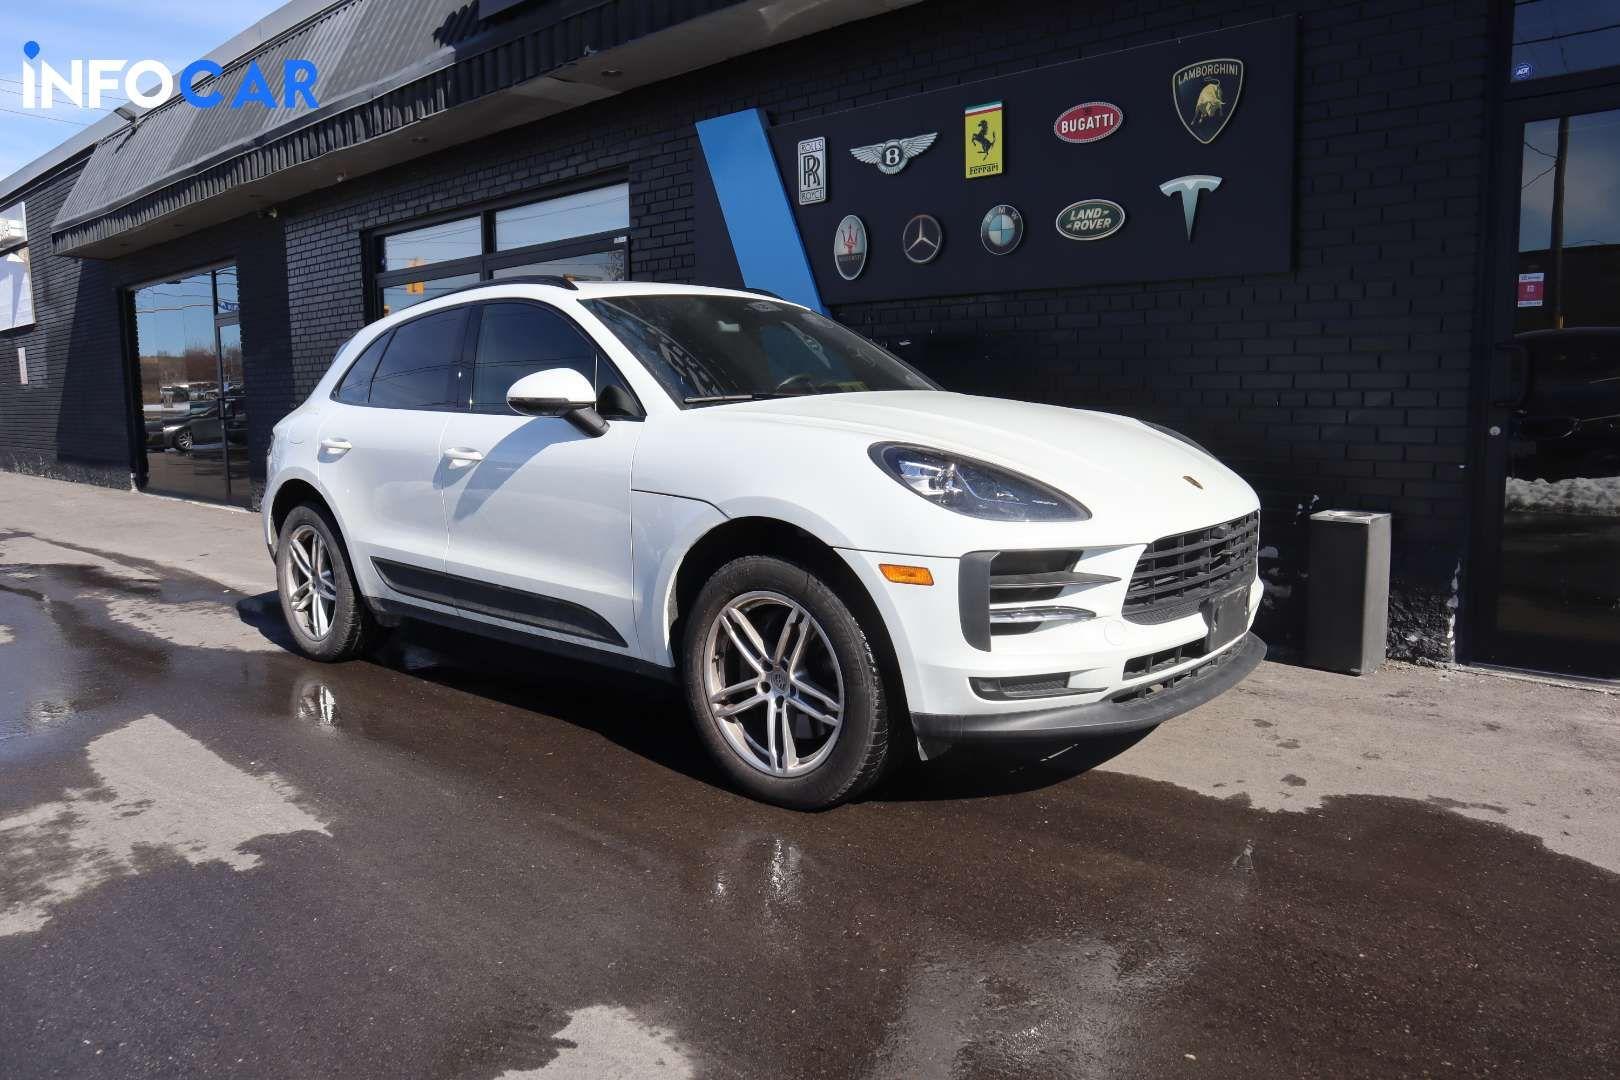 2019 Porsche Macan S - INFOCAR - Toronto's Most Comprehensive New and Used Auto Trading Platform